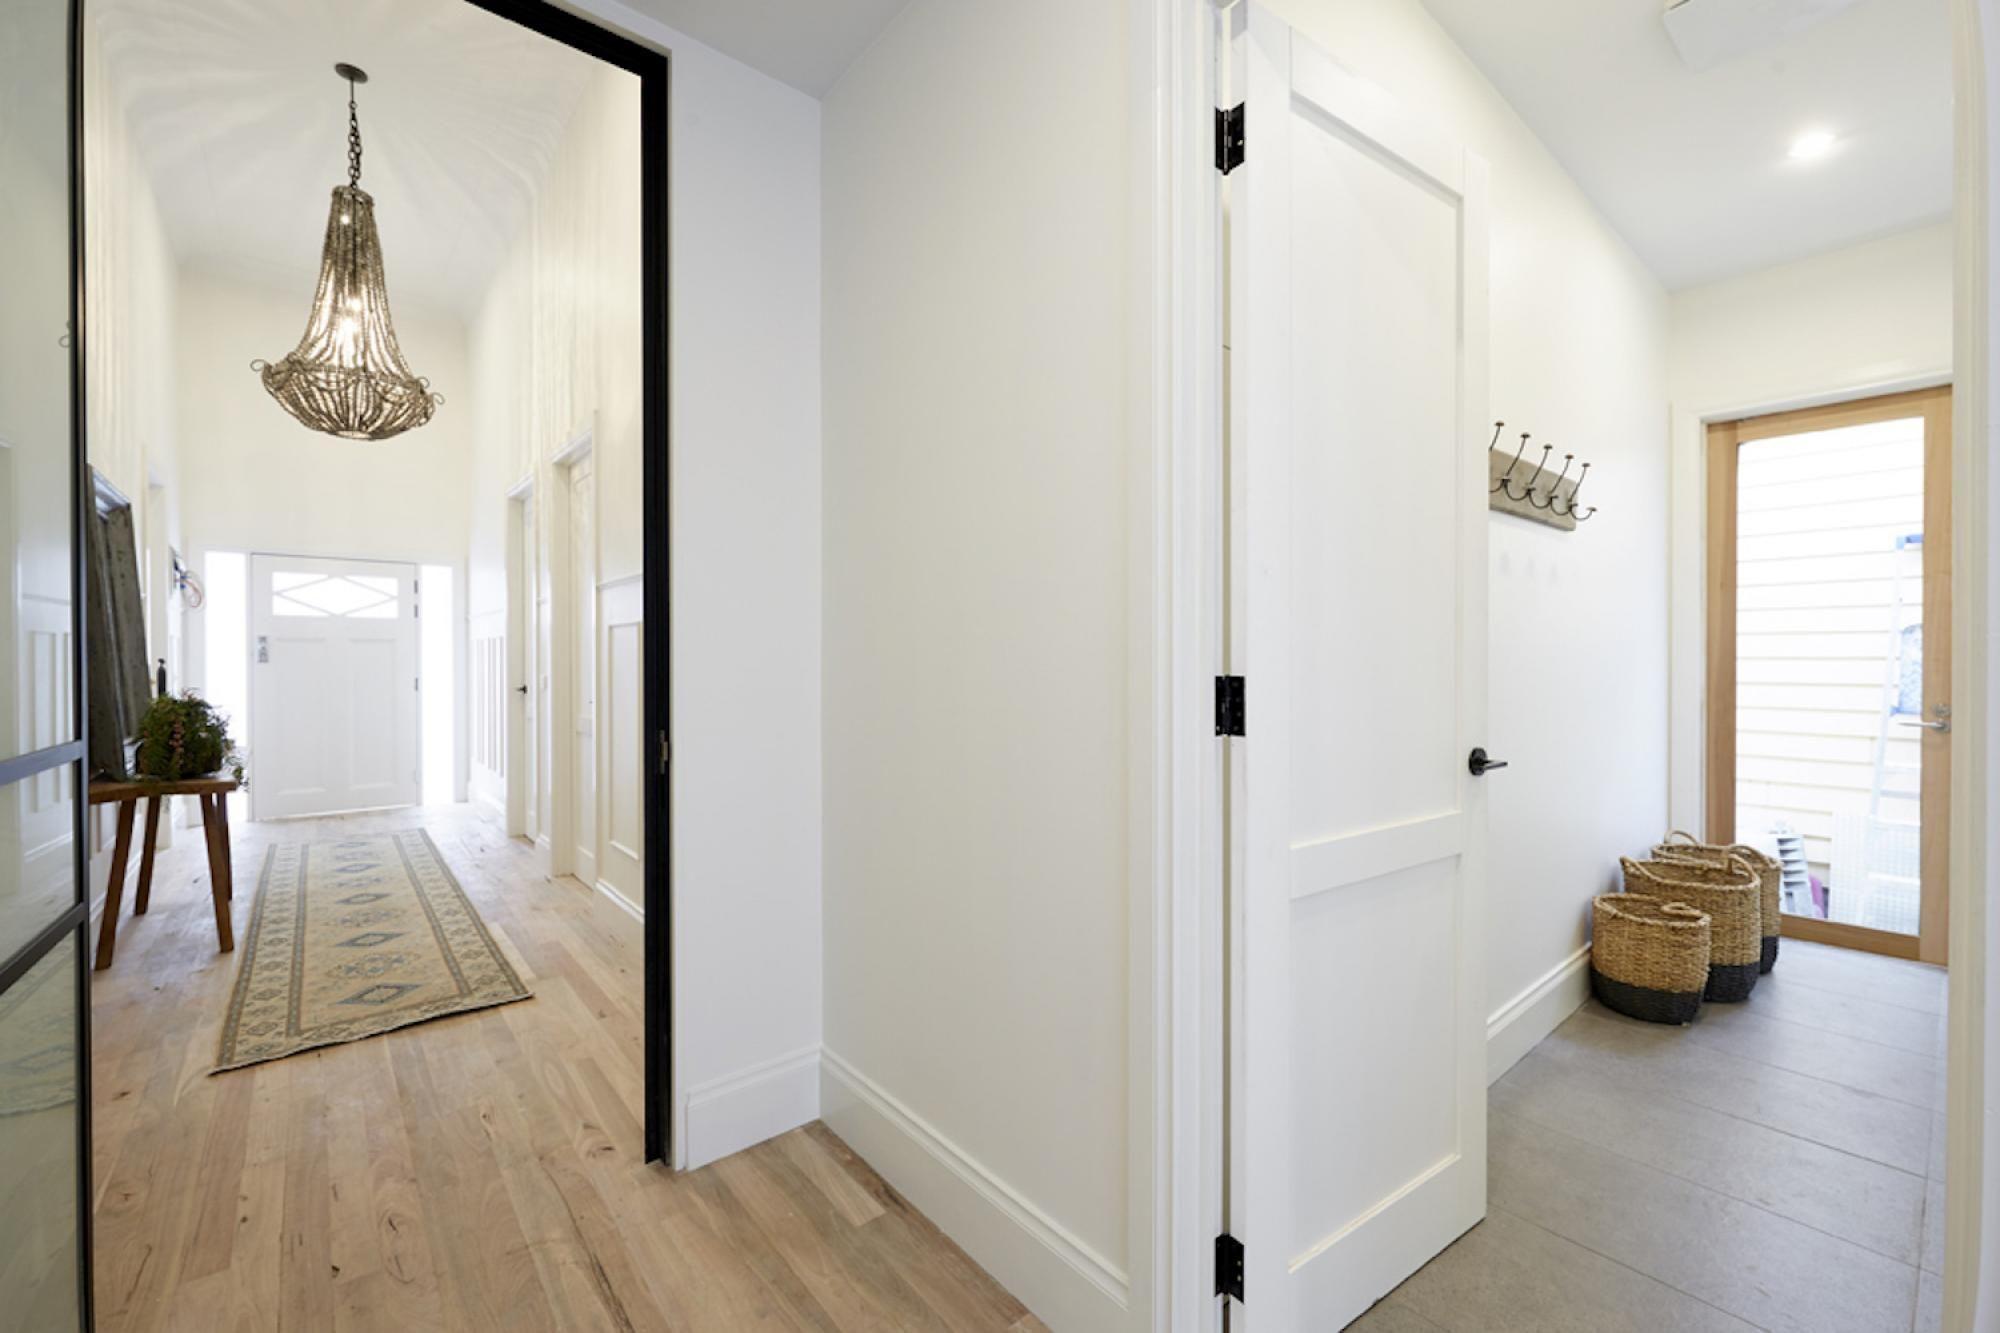 armchair wayfair furniture langley vancouver wa reviews blinds pdx budget street